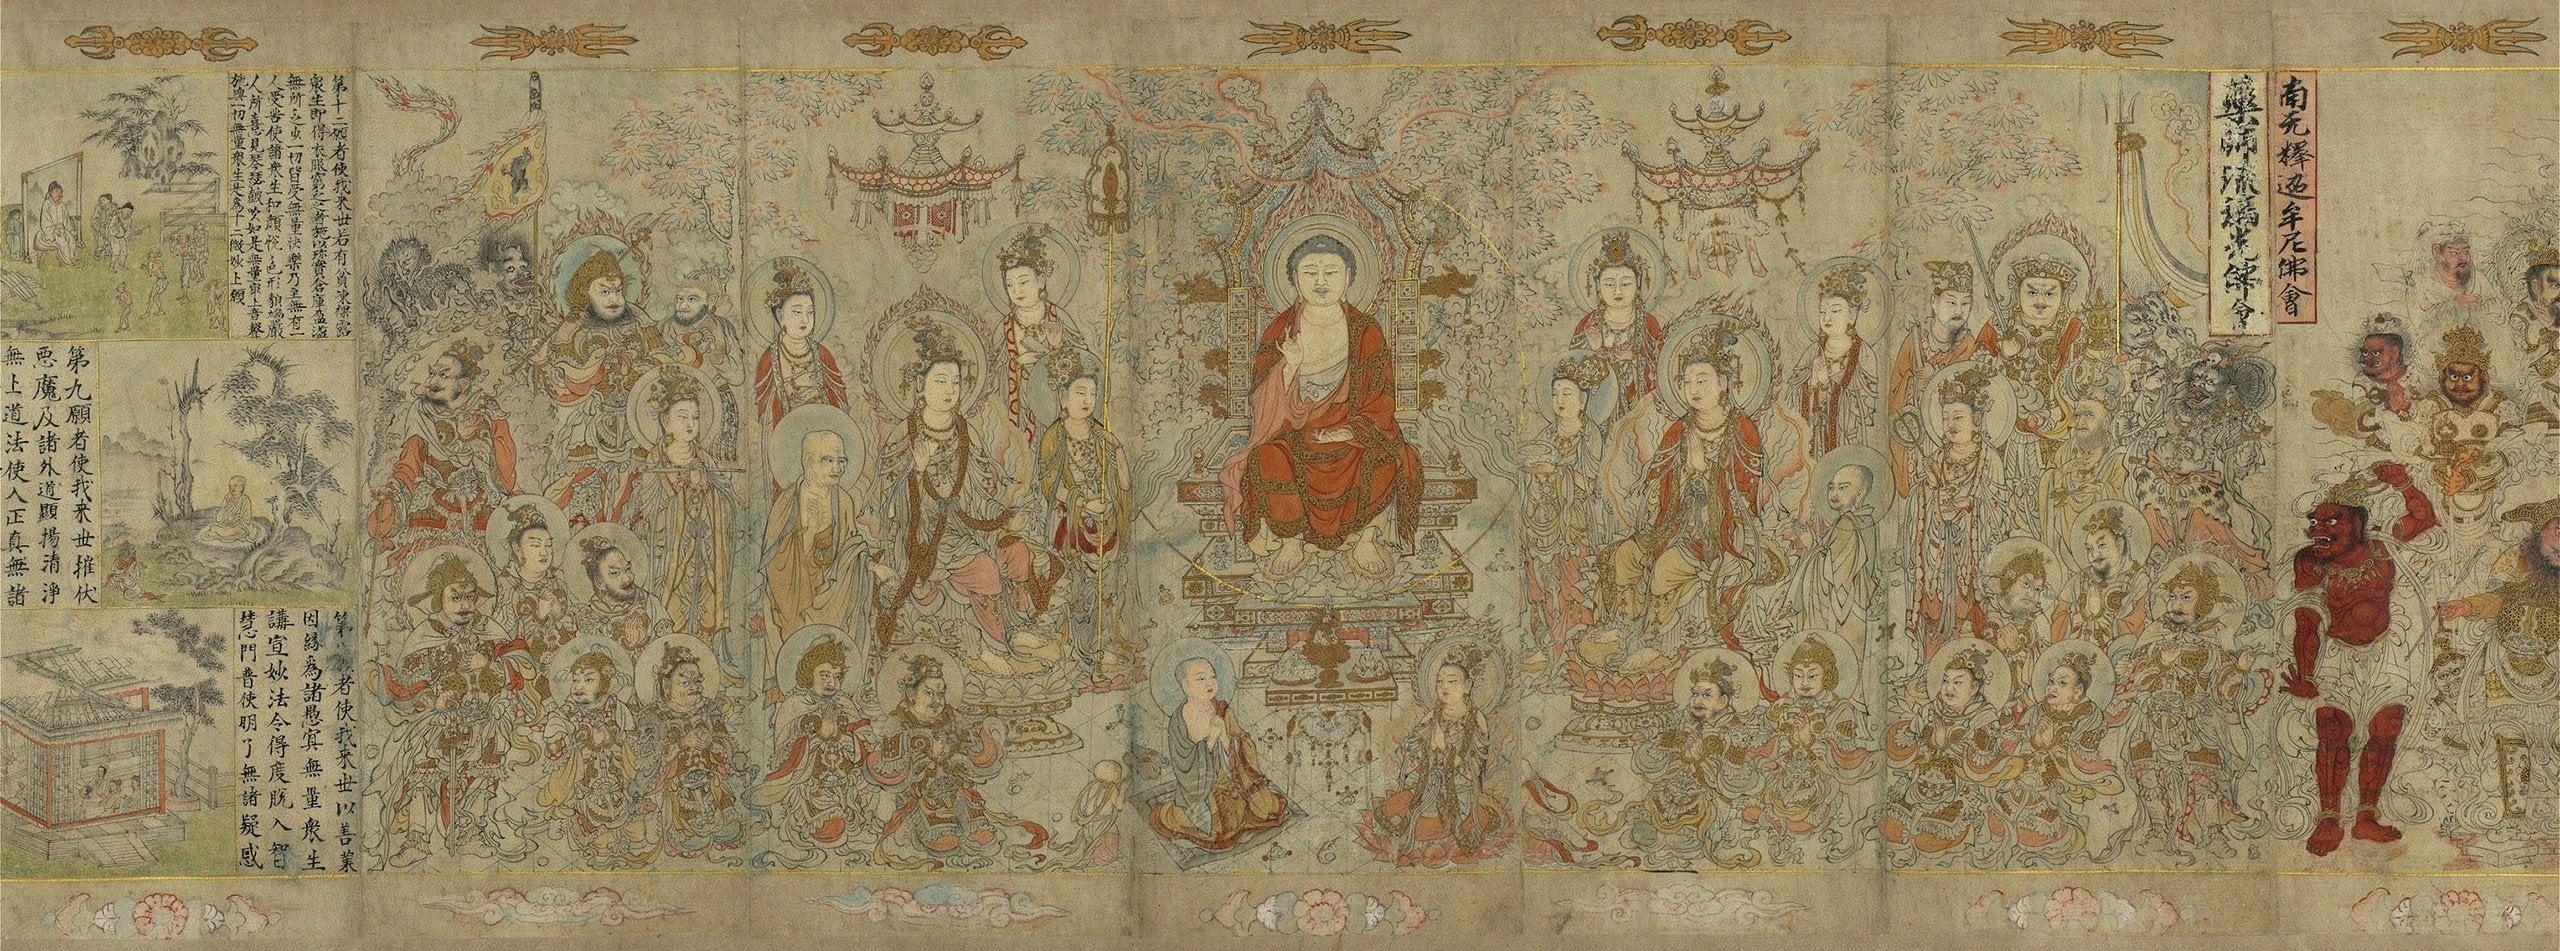 zhang shengwen lenseignement de bouddha sakyamuni